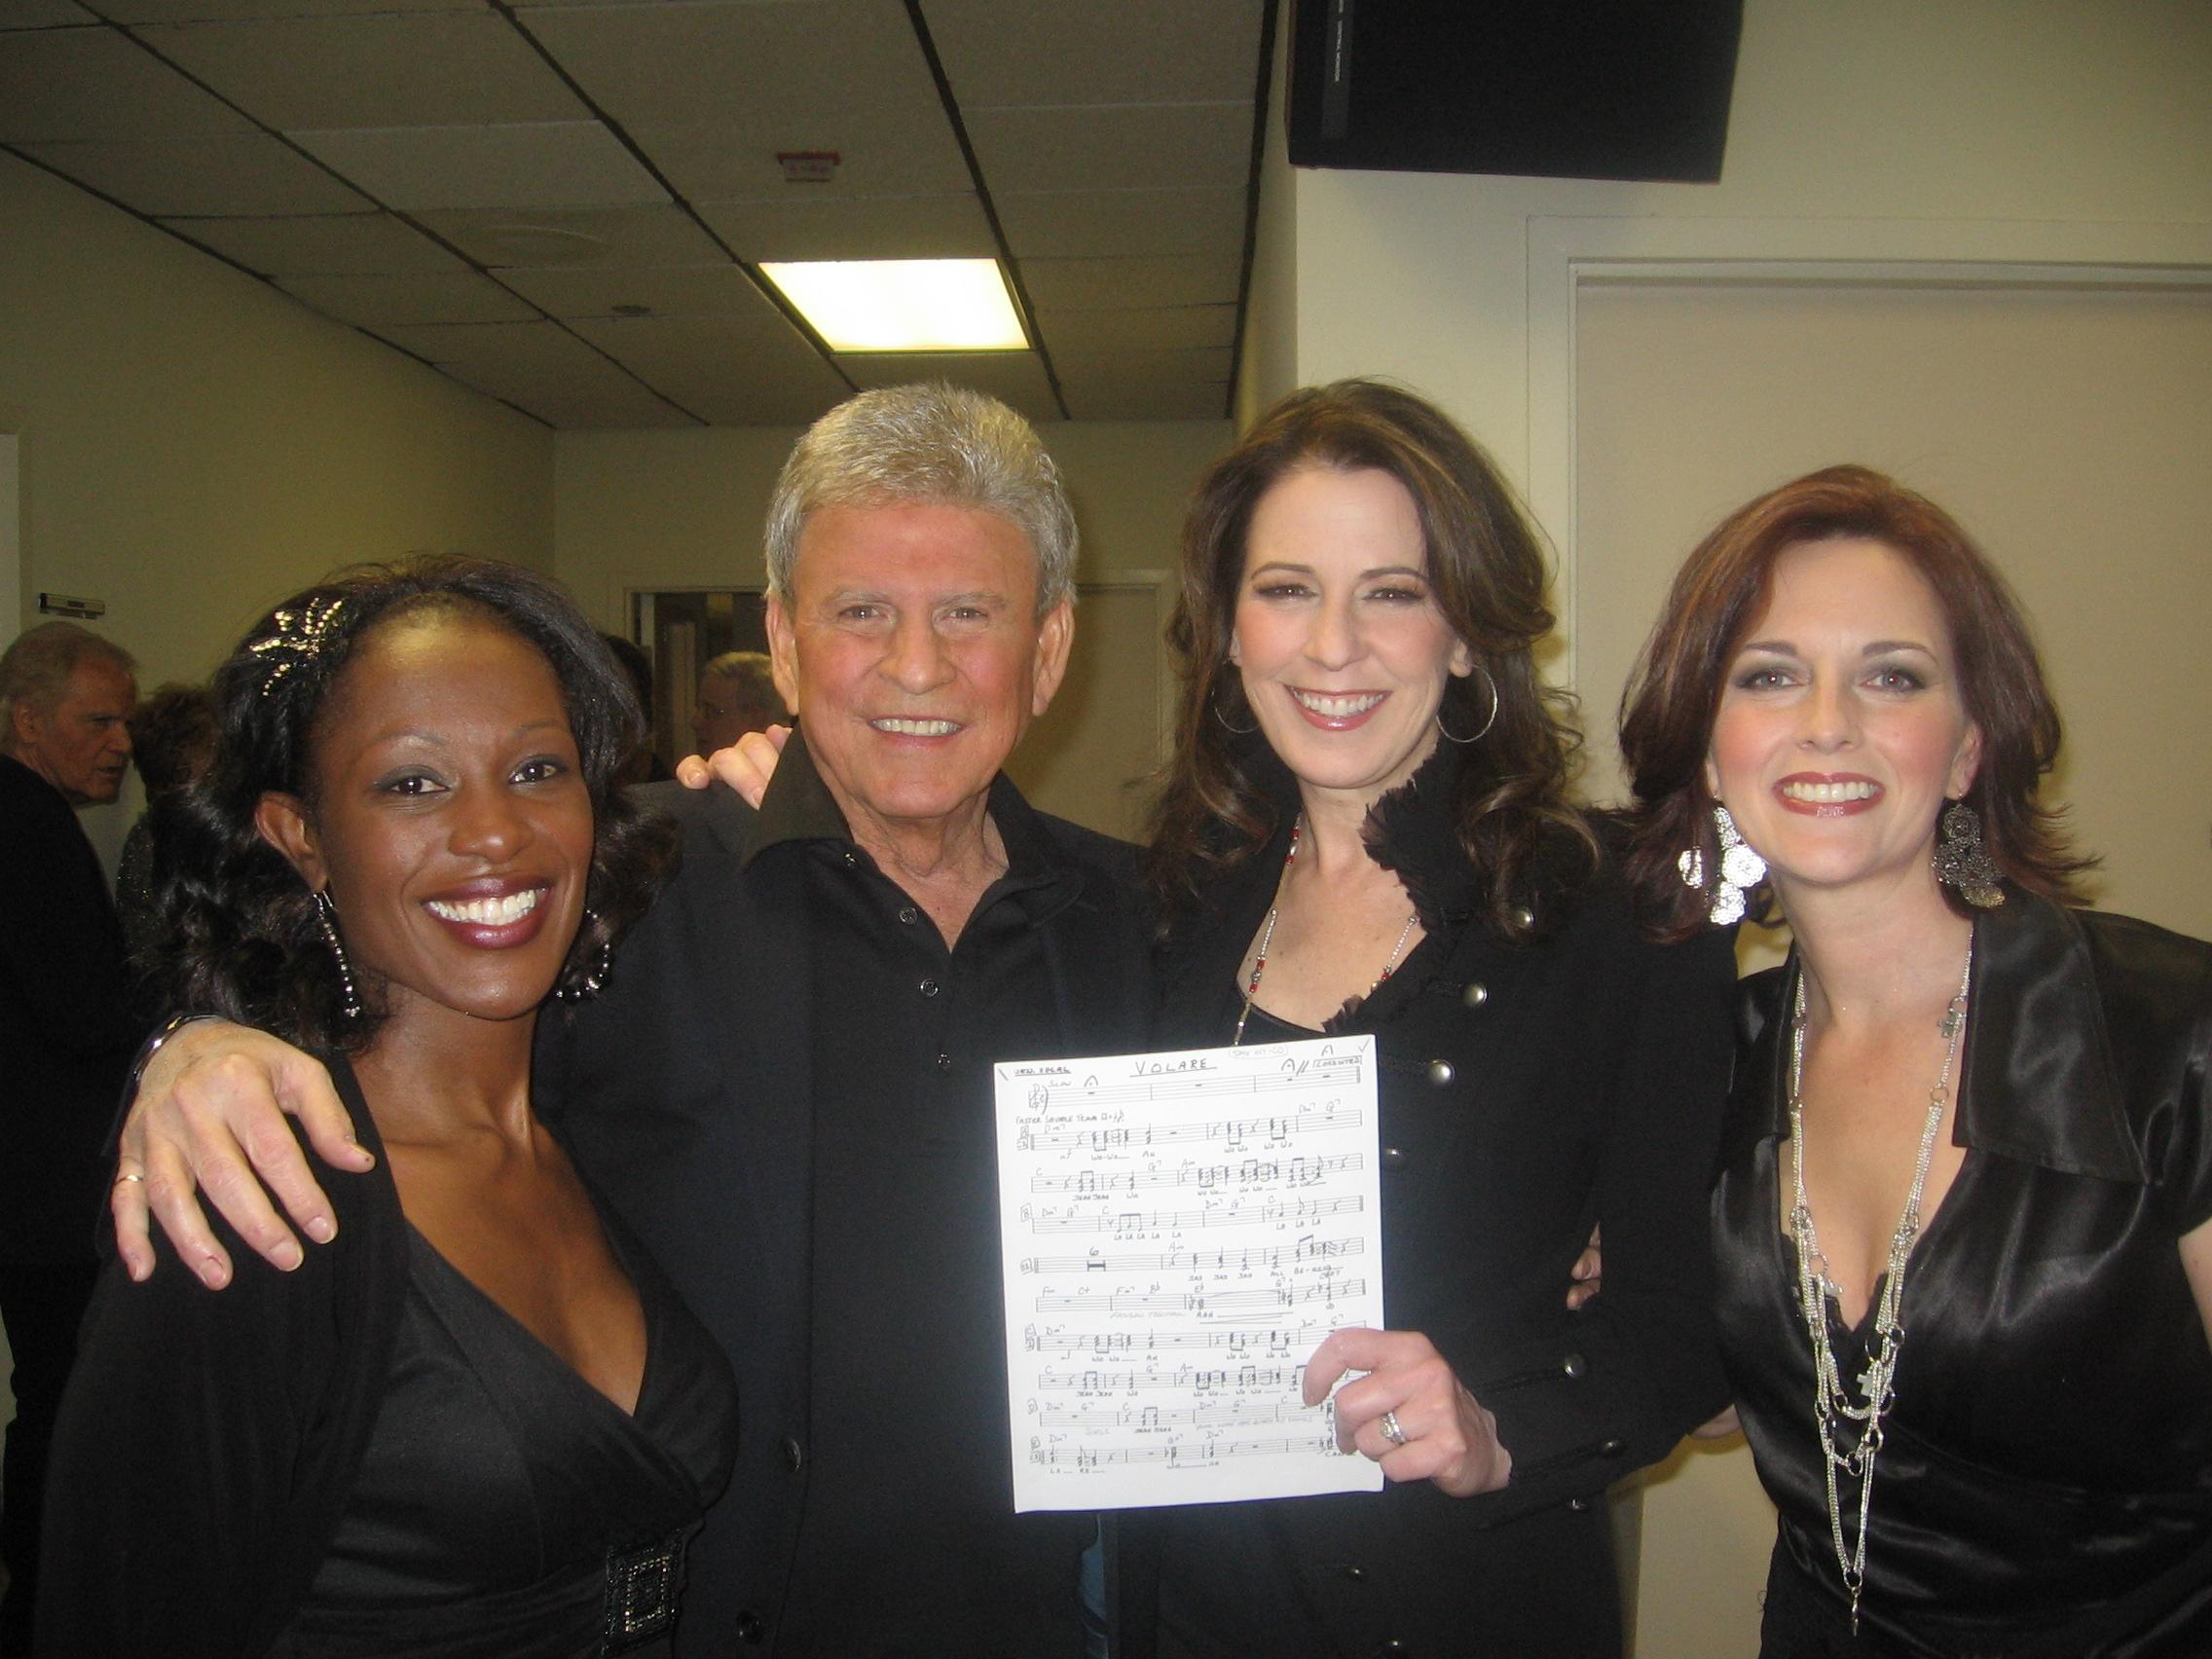 Backstage with Bobby Rydell and fellow backup singers, Tiffany Nesbit Jones and Kristina Pruitt